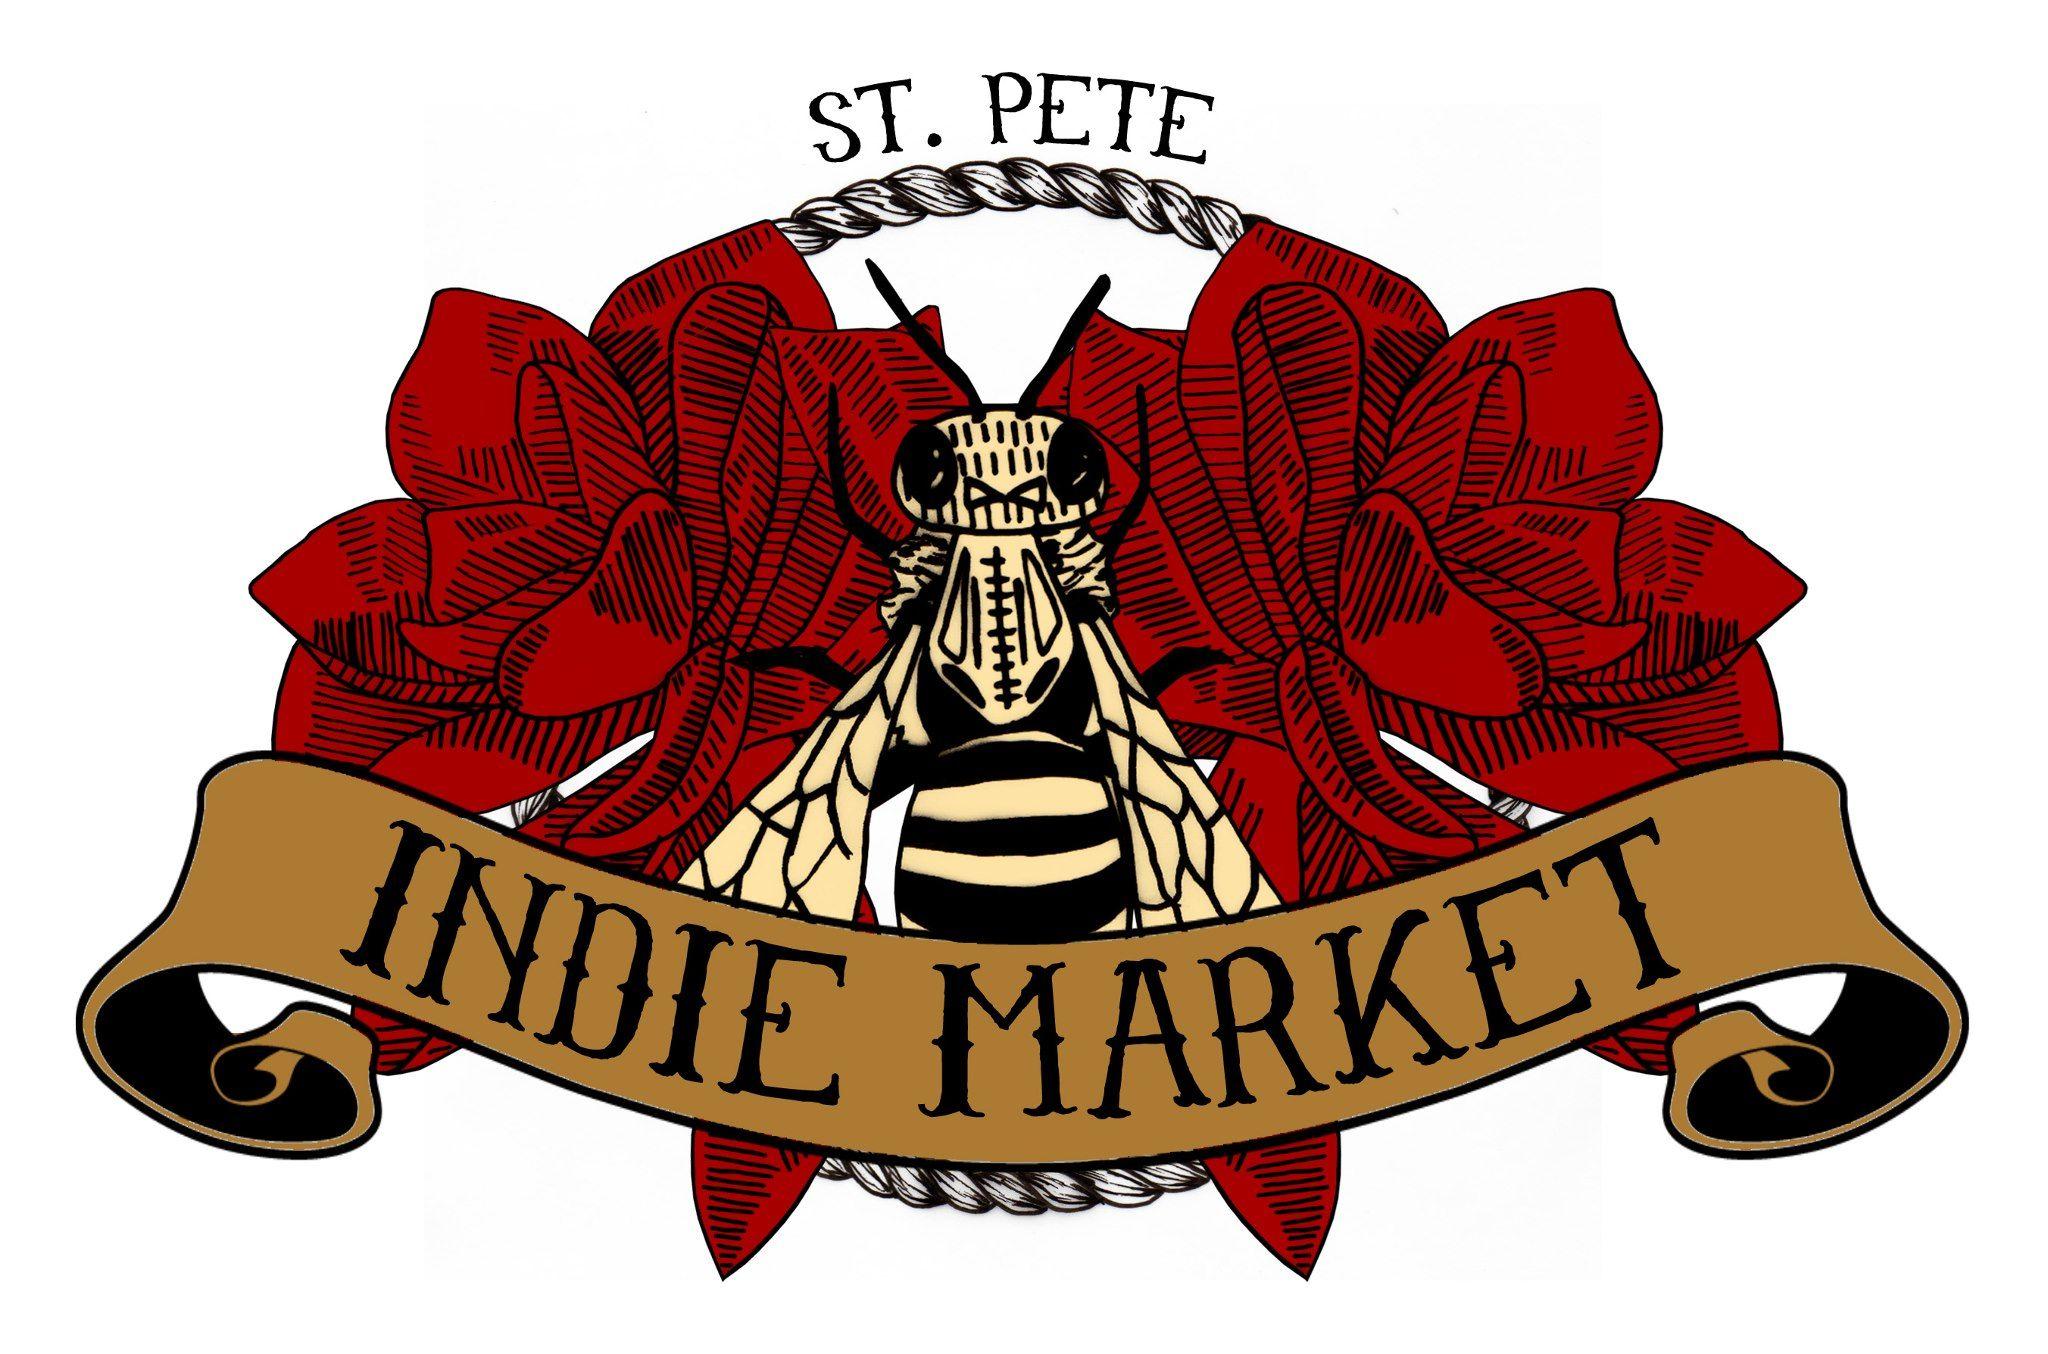 St. Pete Indie Market logo ST. PETE Event marketing